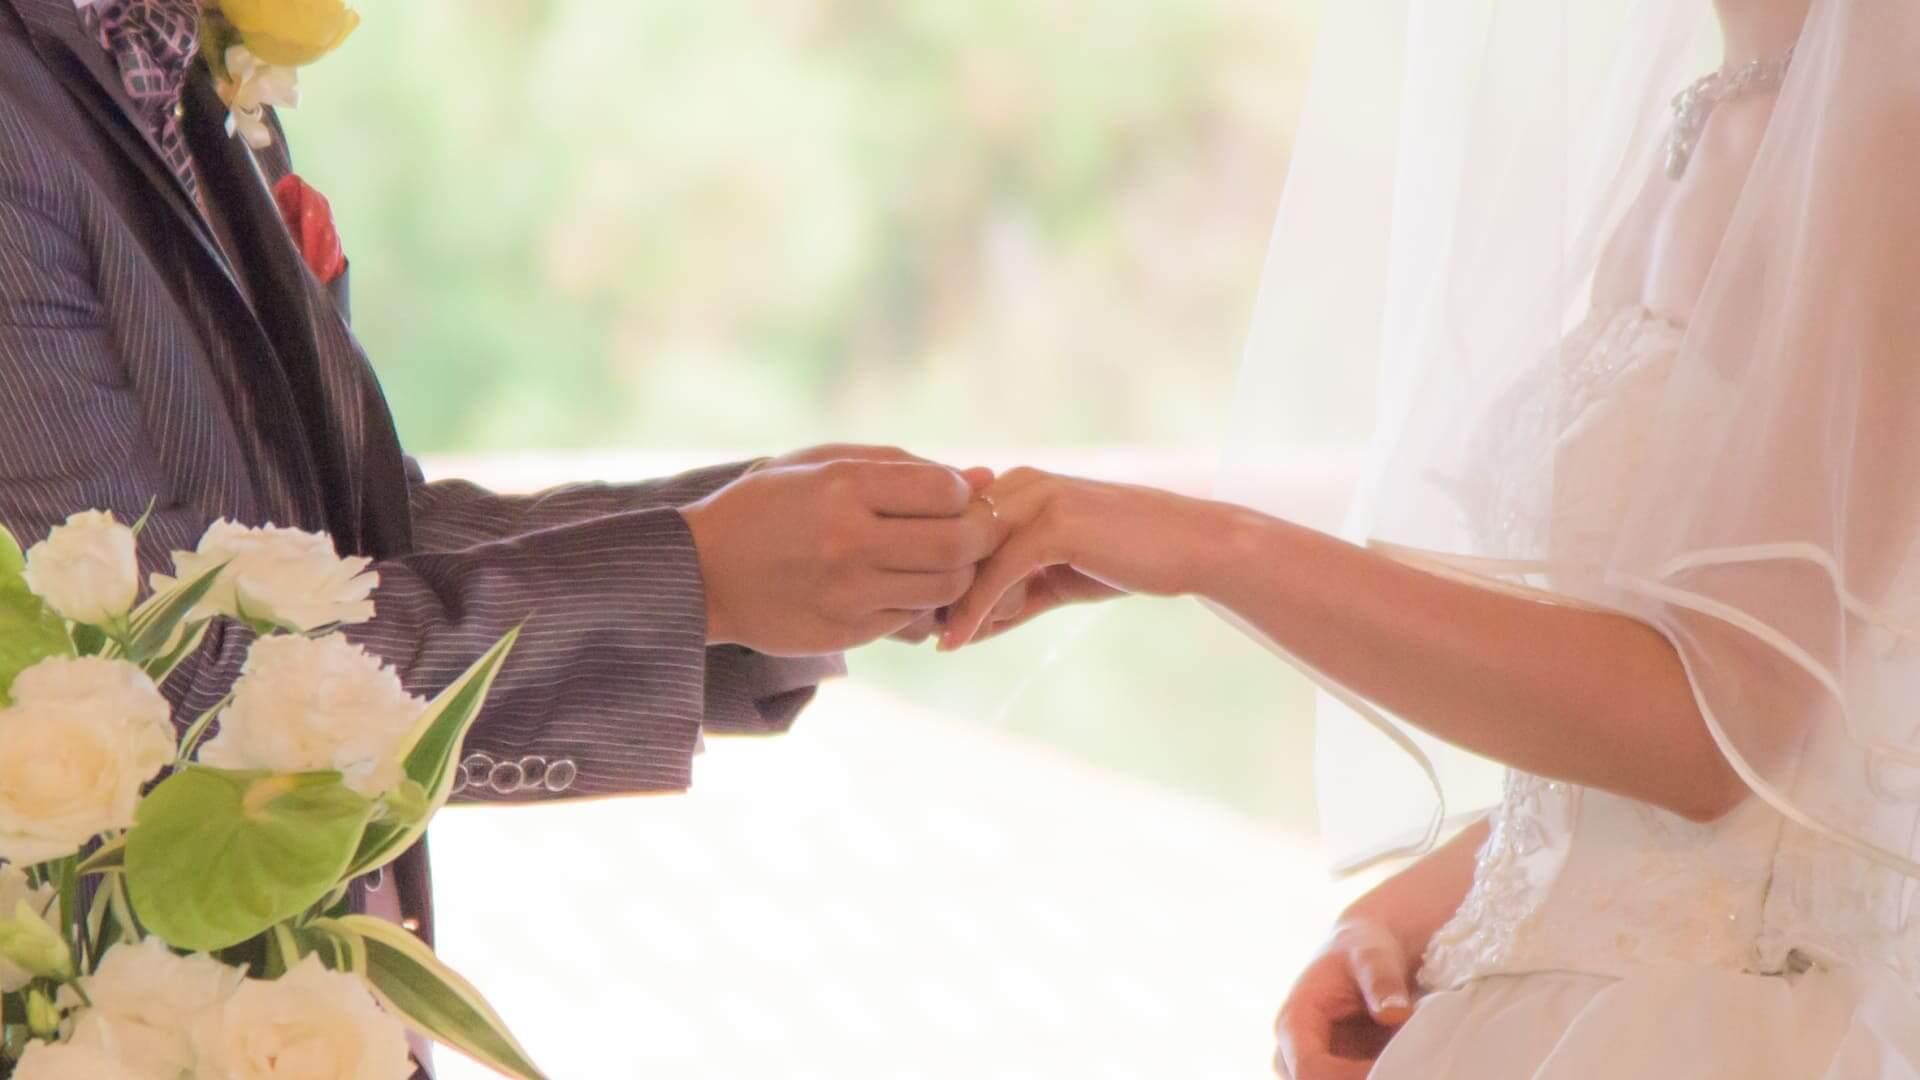 LoveMeDo恋愛占い|片思いのあの人と交際したら…結婚確率はズバリ!